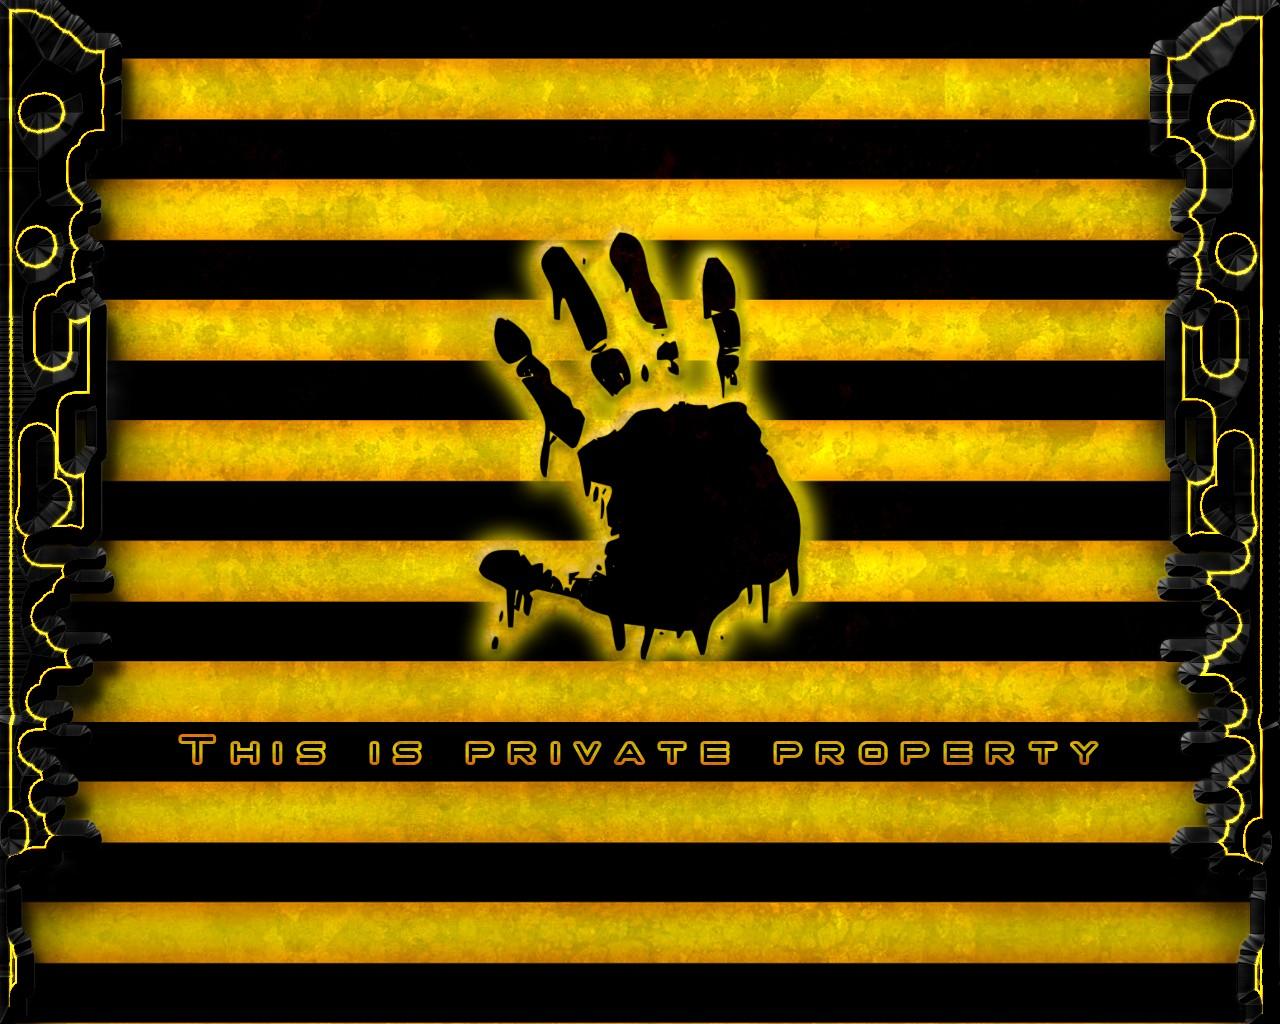 General 1280x1024 hands yellow black